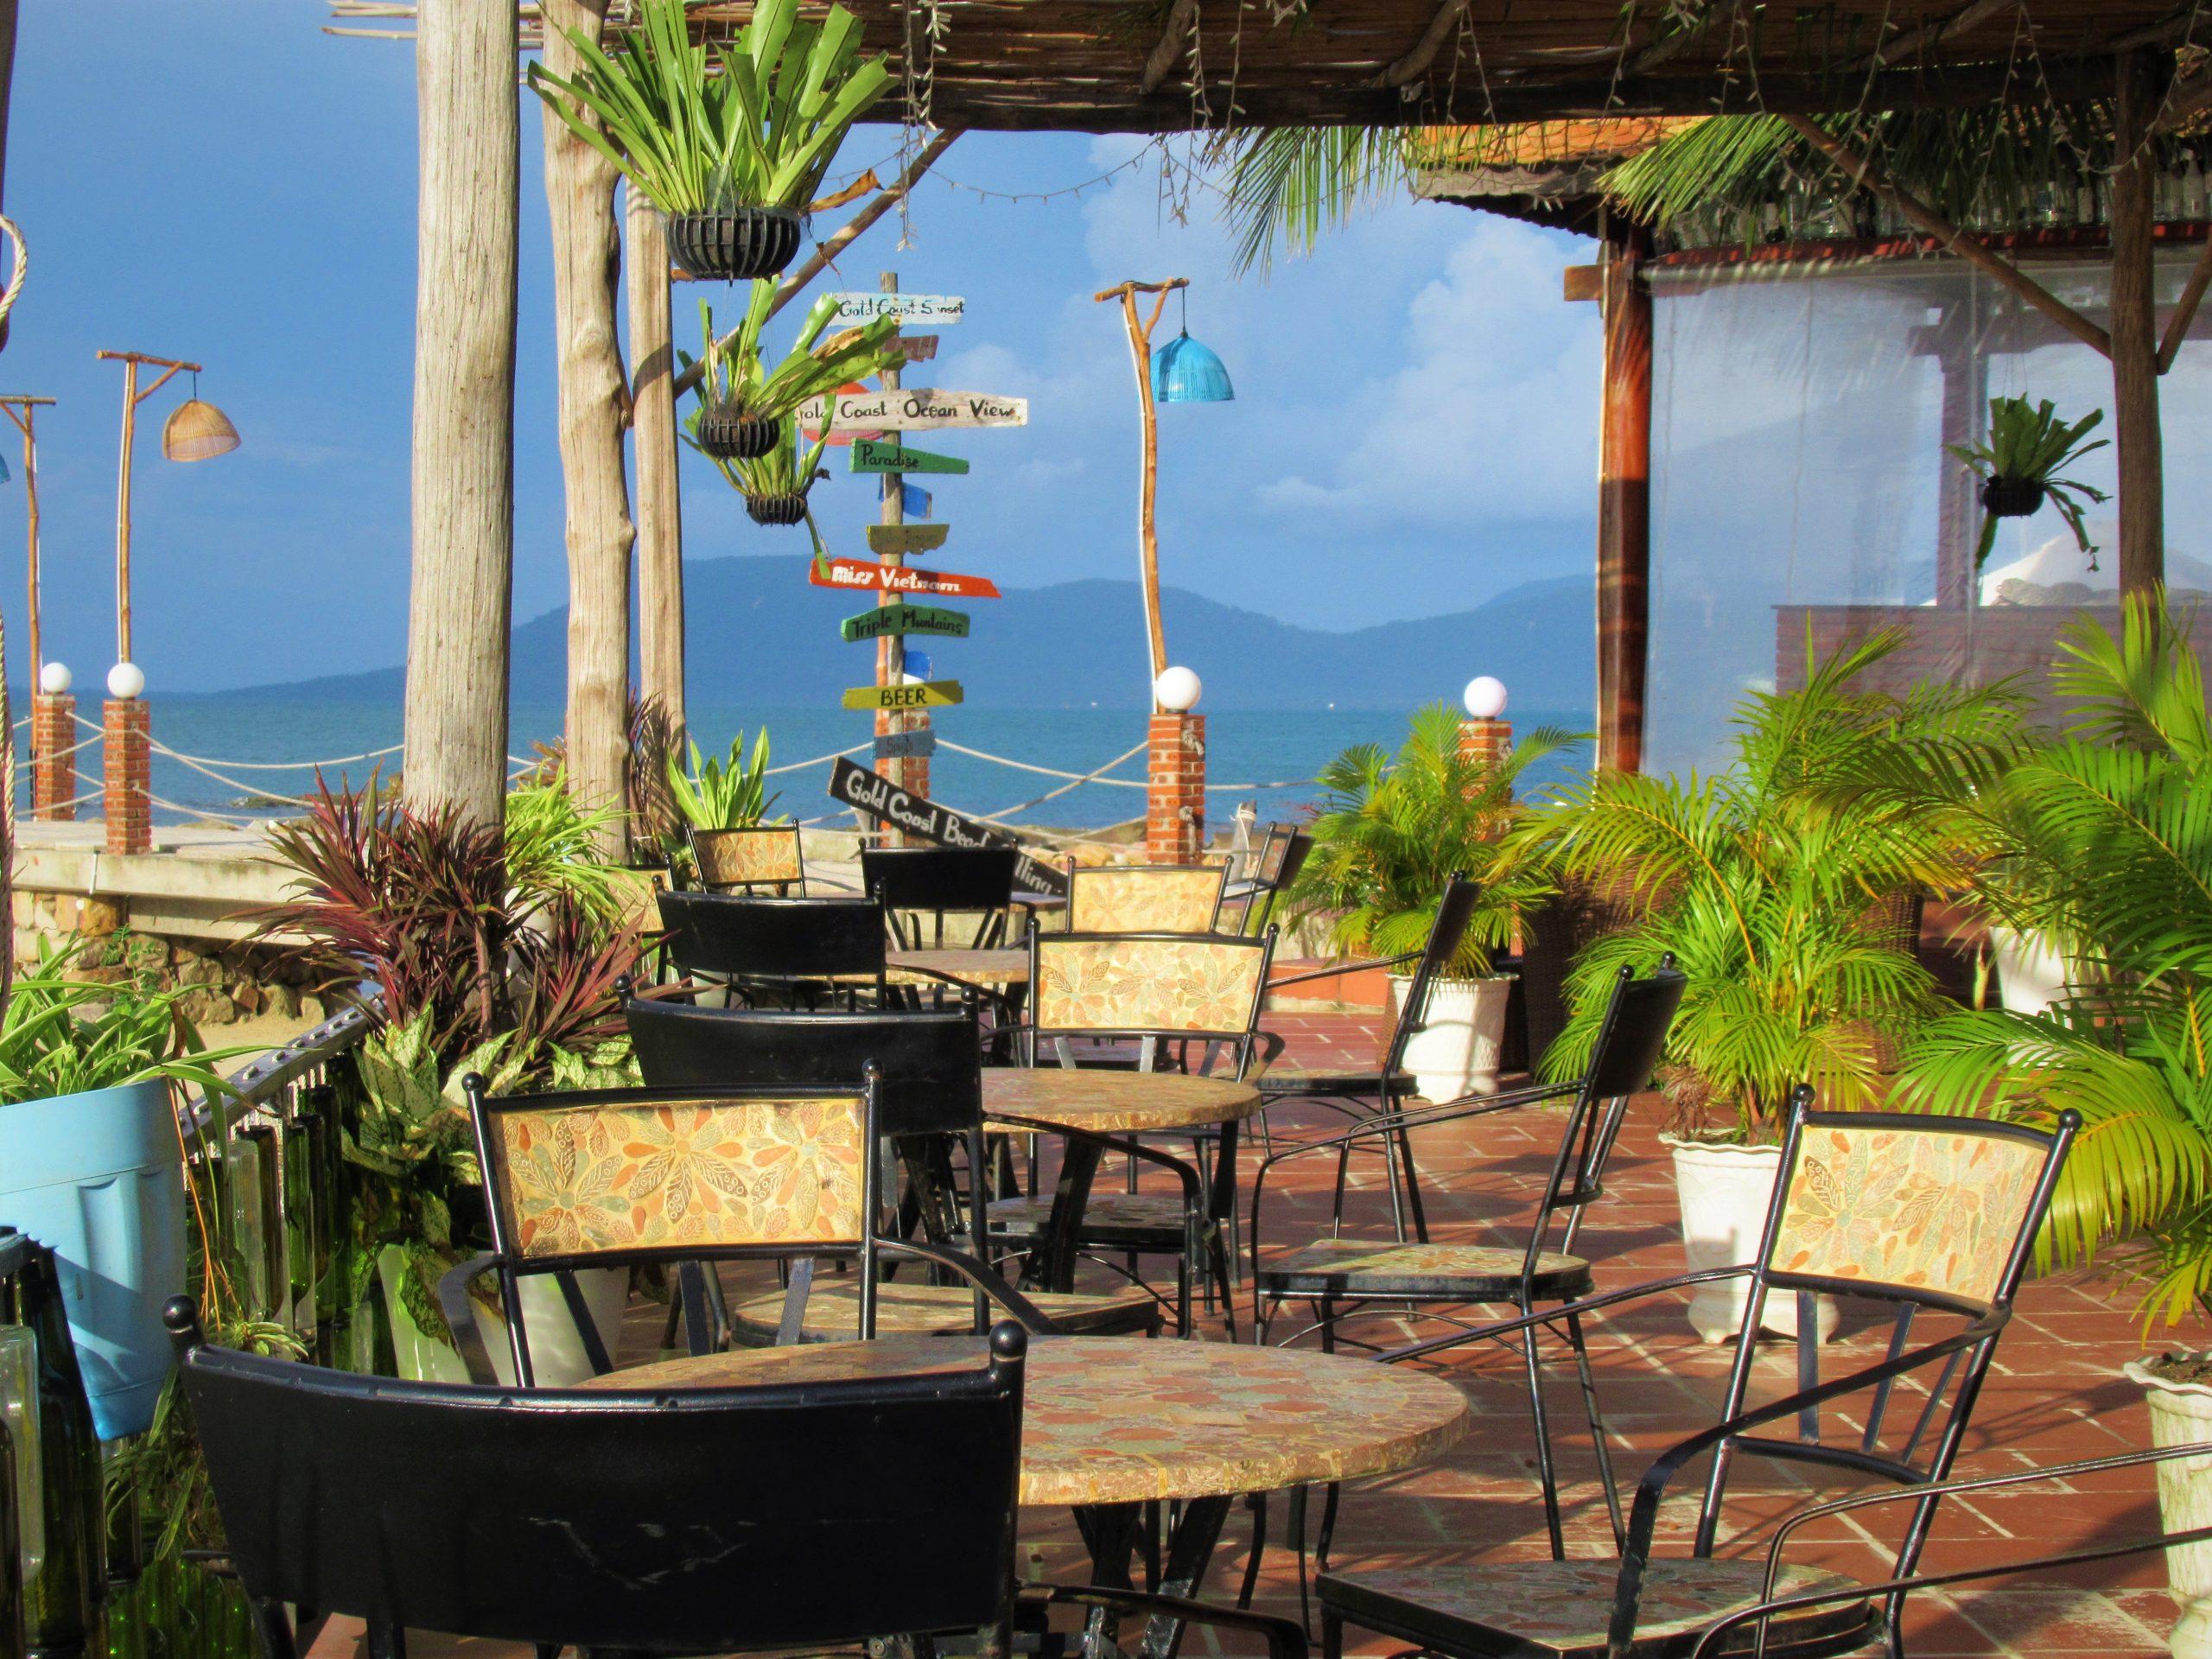 Beach bar at Gold Coast Resort, Phu Quoc Island, Vietnam